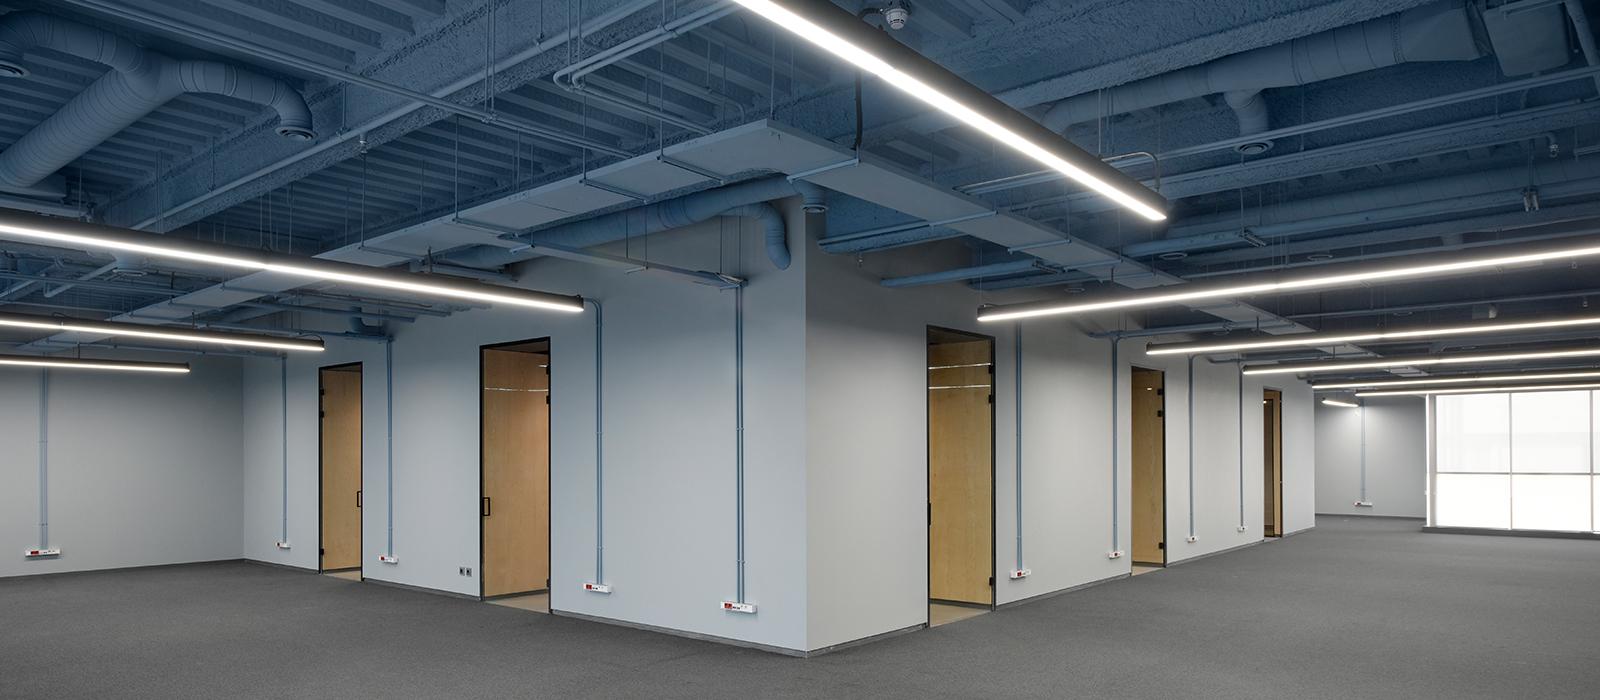 Fenos LED Lighting Project Office Café Bazzar Banner